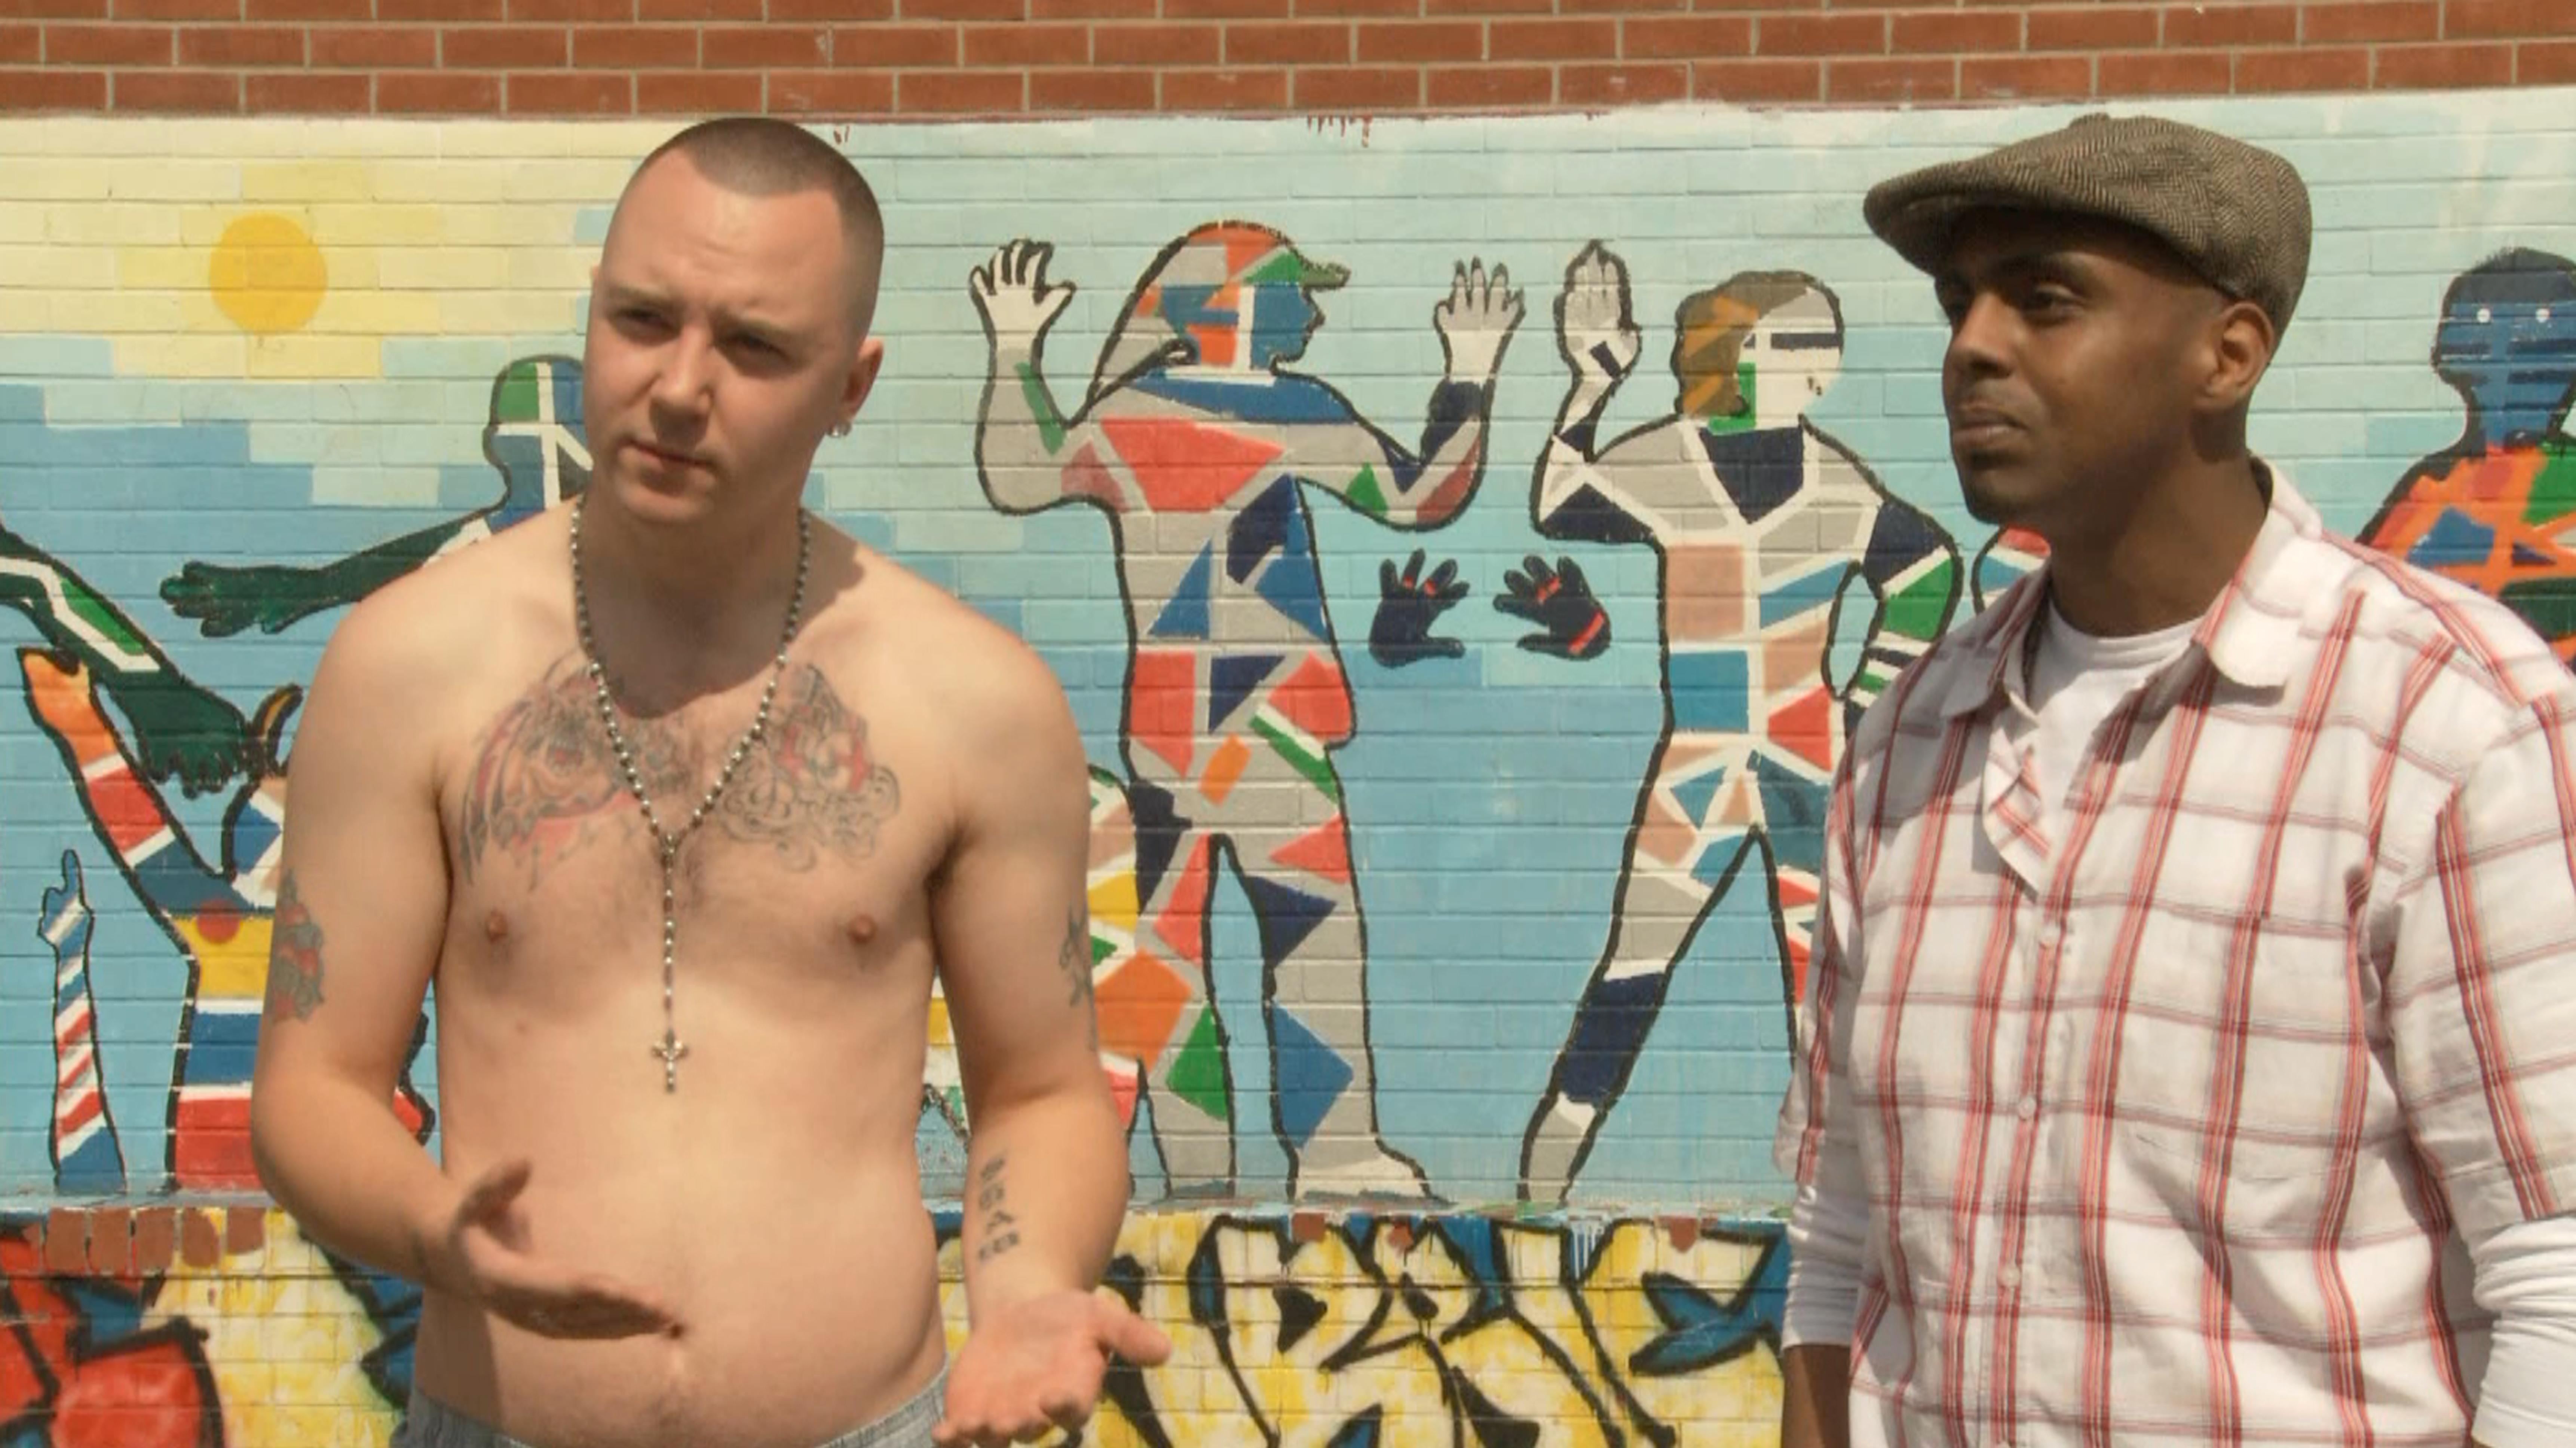 Hamdi Ahmed discutant immigration avec son voisin  xénophobe.jpg